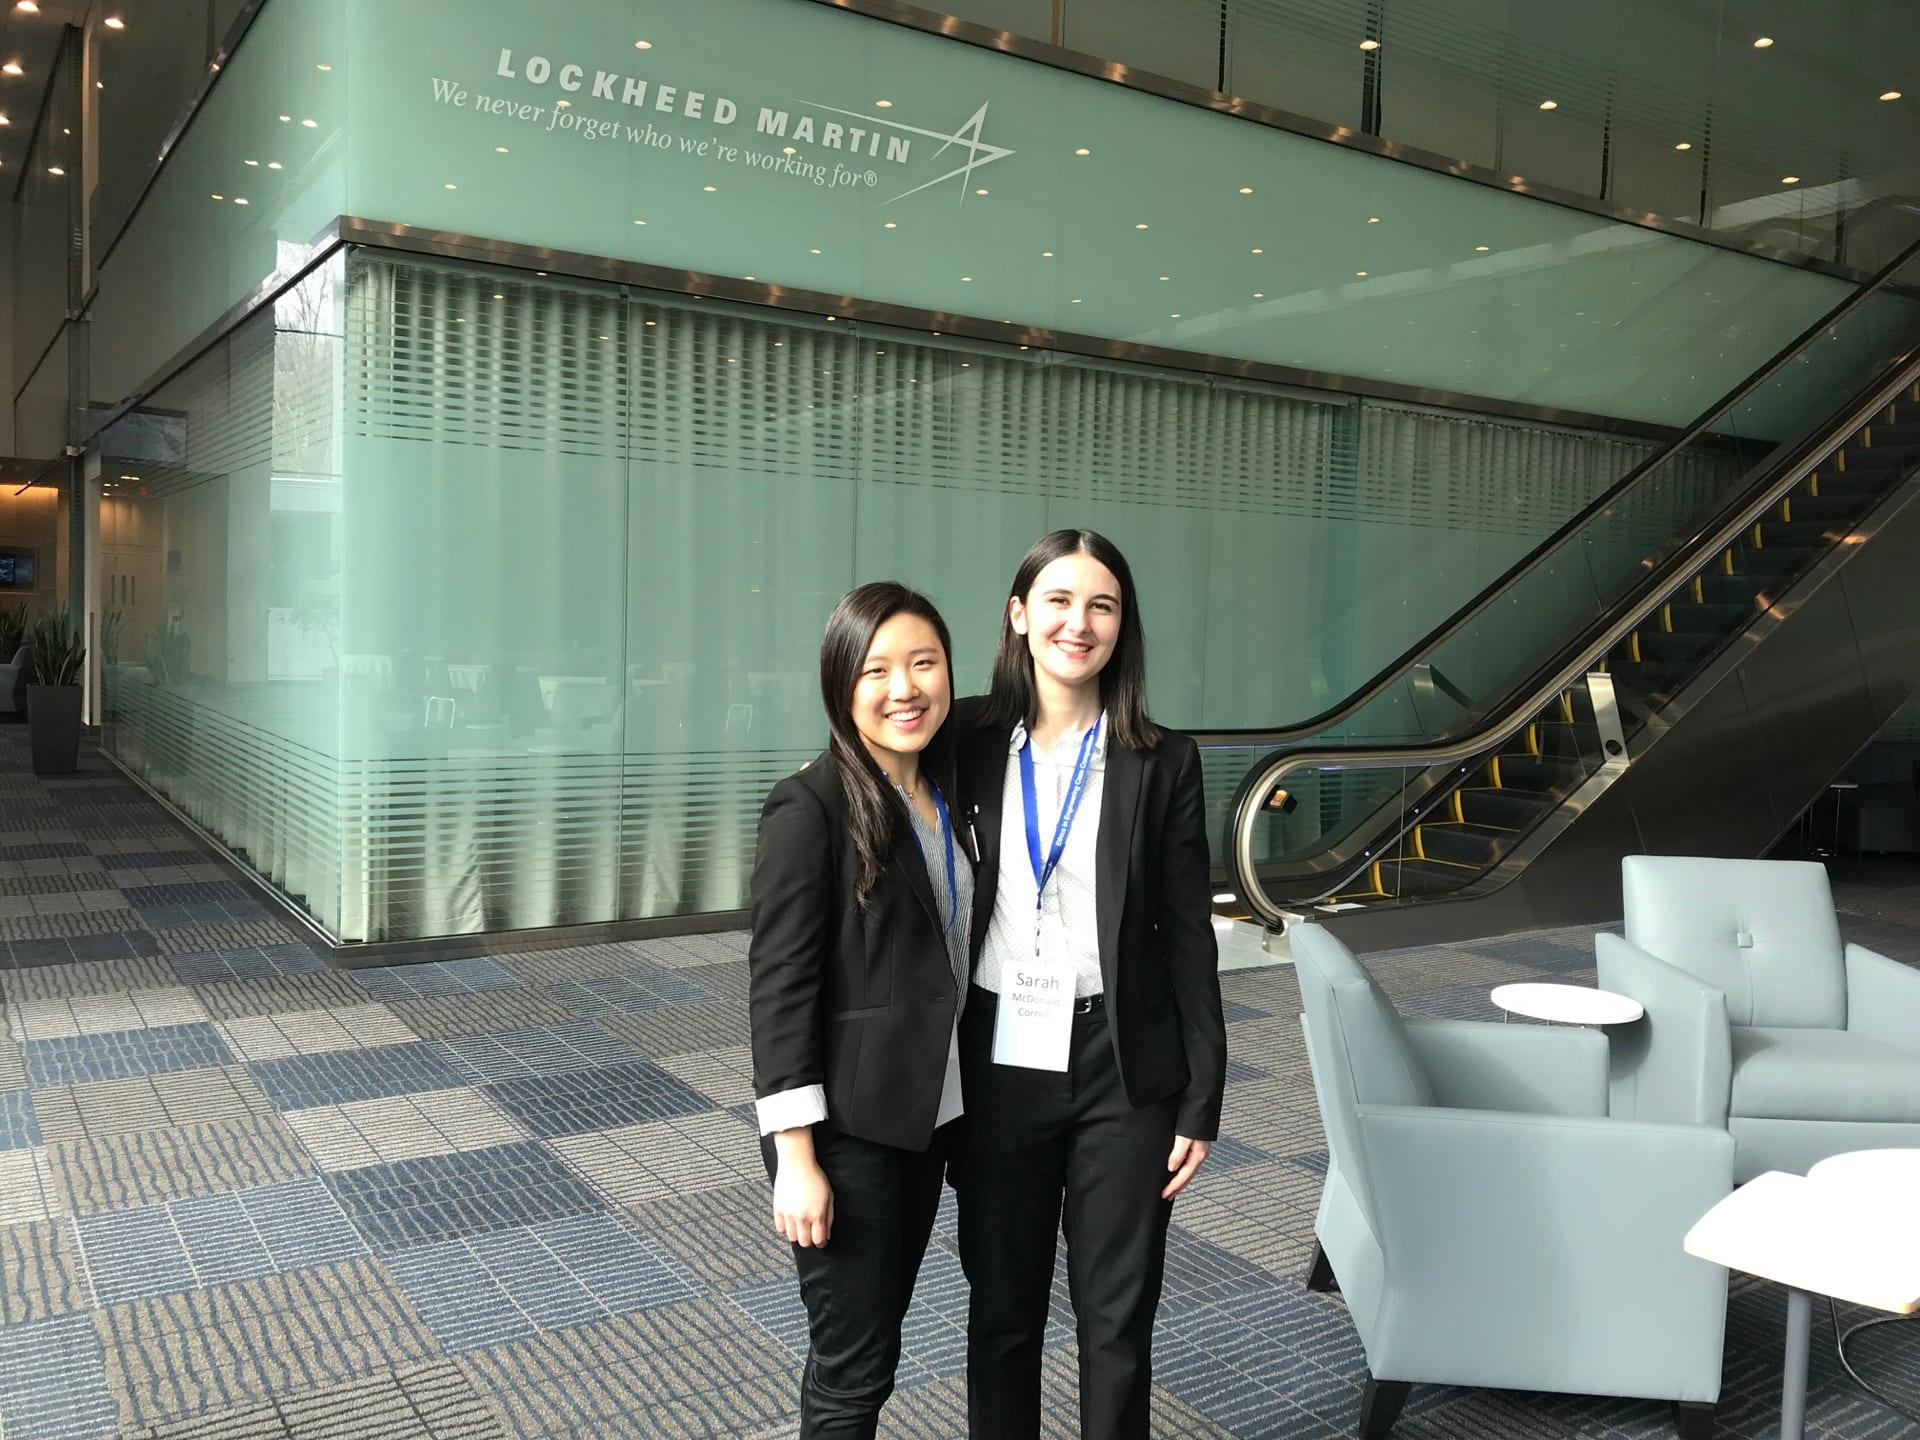 Sarah MacDonald and Adeline Tse stand beneath a Lockheed Martin Co. sign